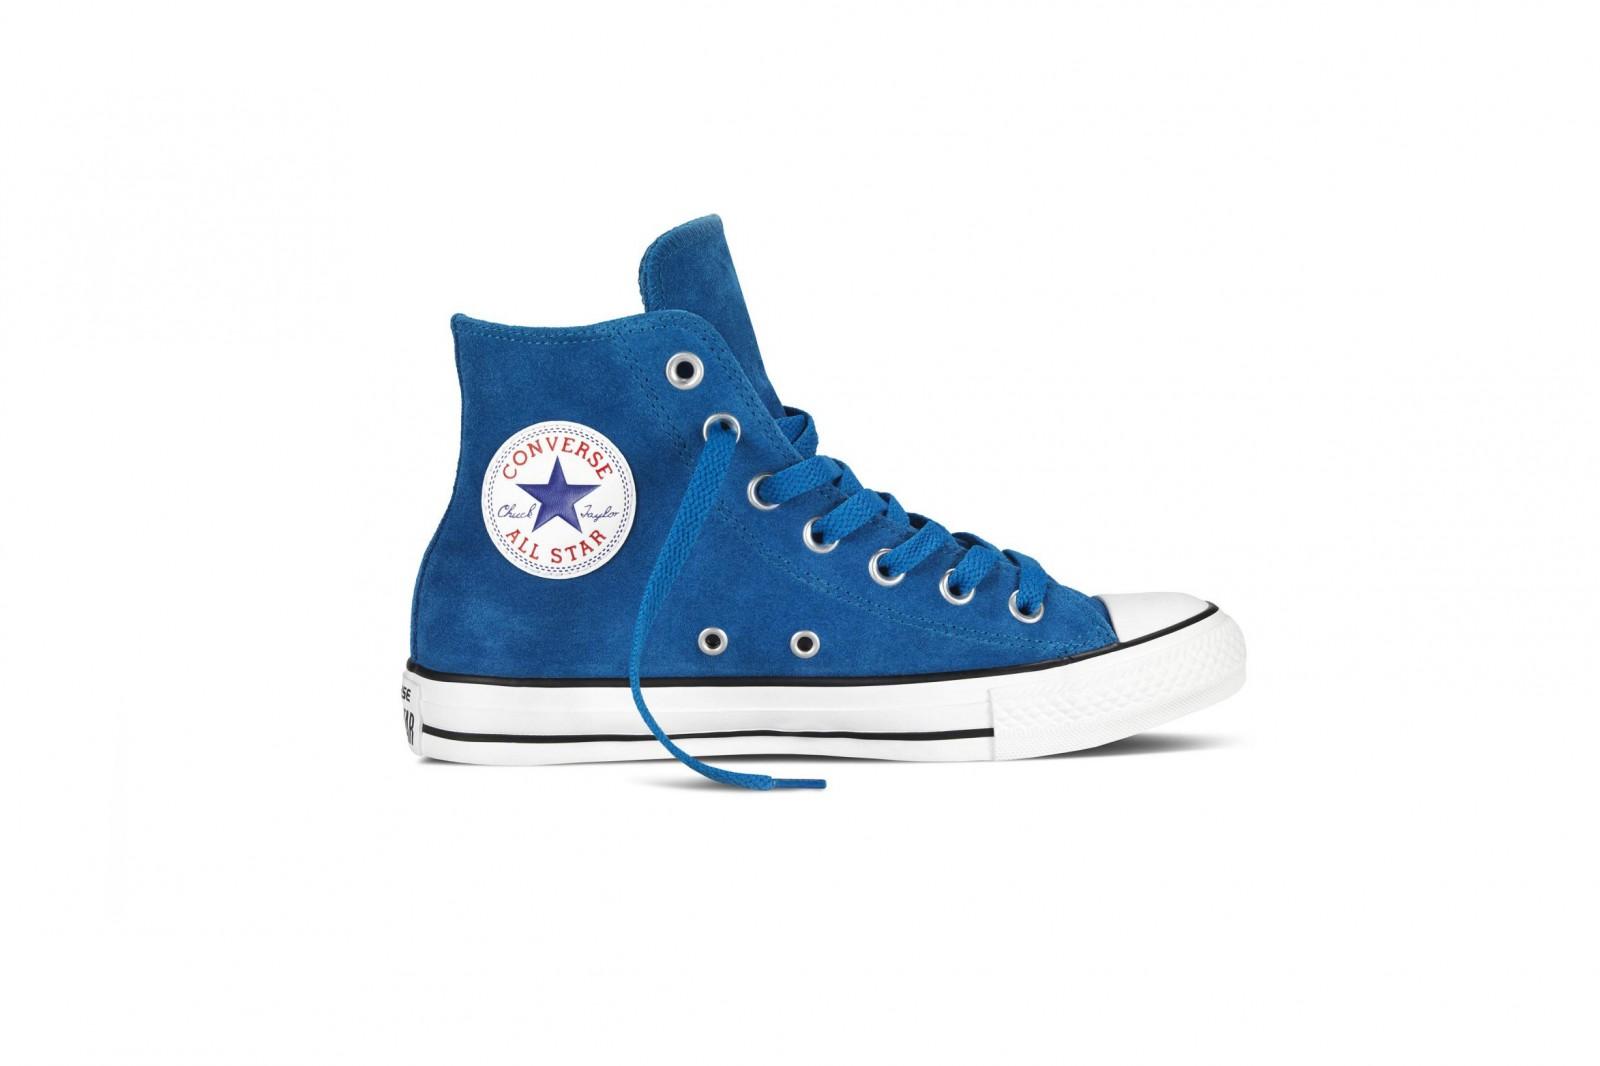 Unisex boty Converse Chuck Taylor All Star semiš modrá  aadaad961b0